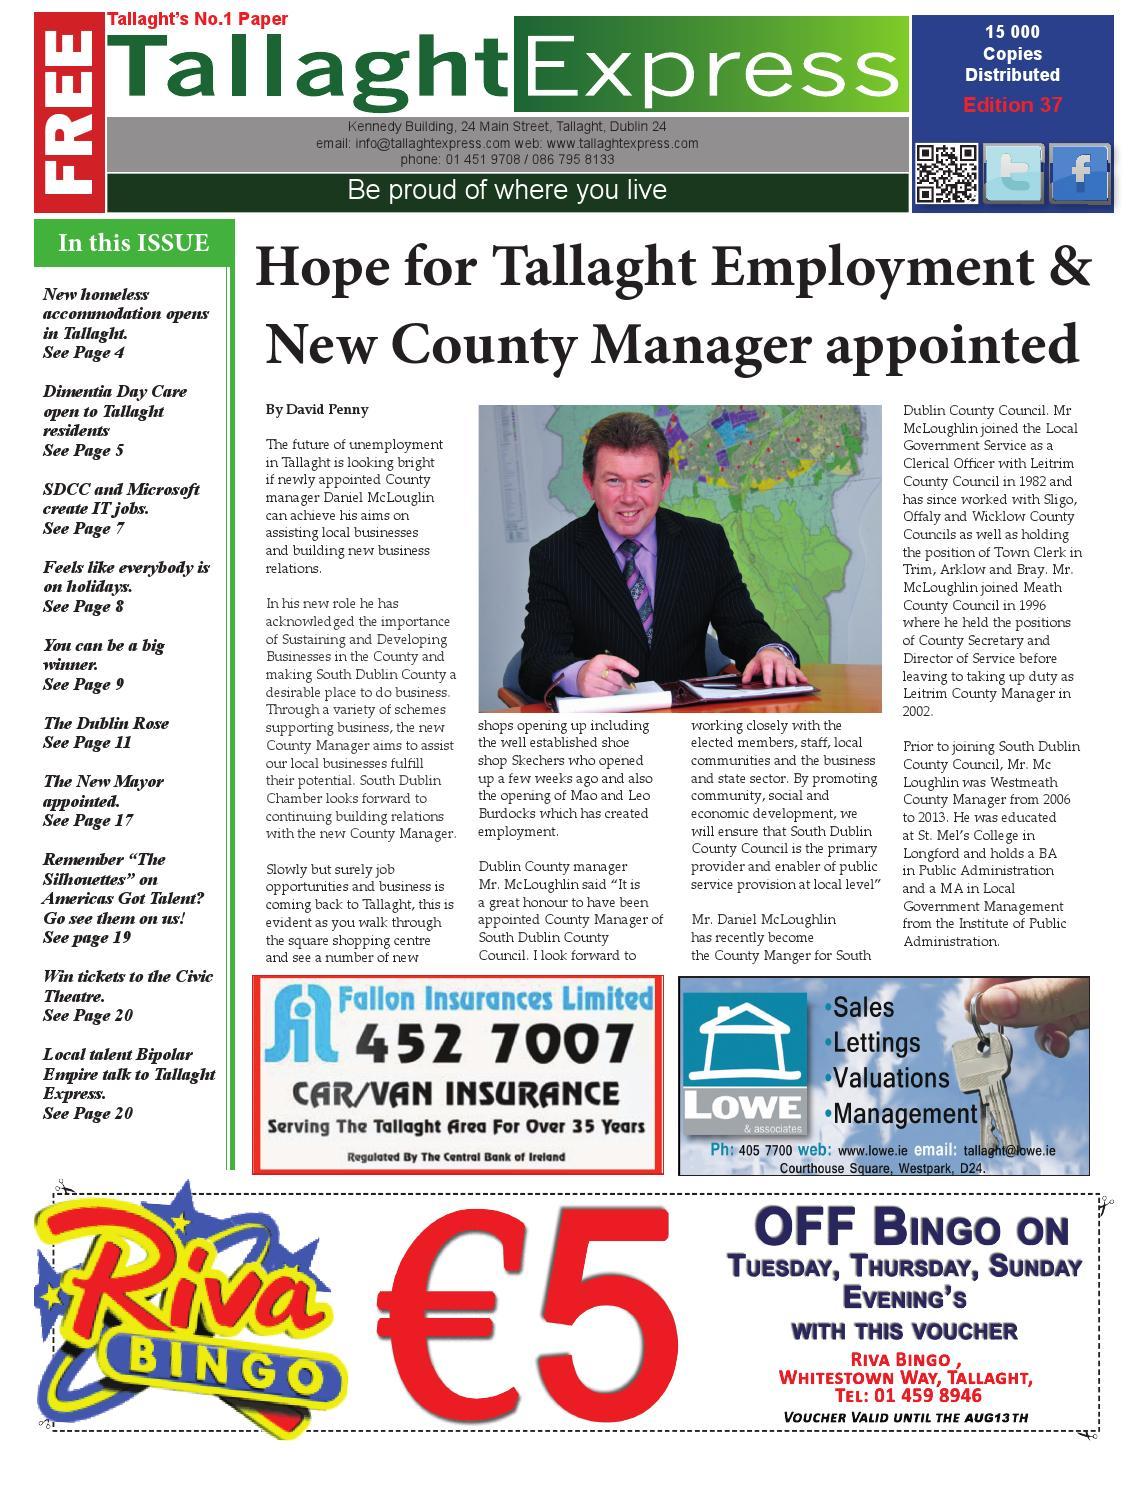 Tallaght to Tullamore - 3 ways to travel via train, tram, line 49